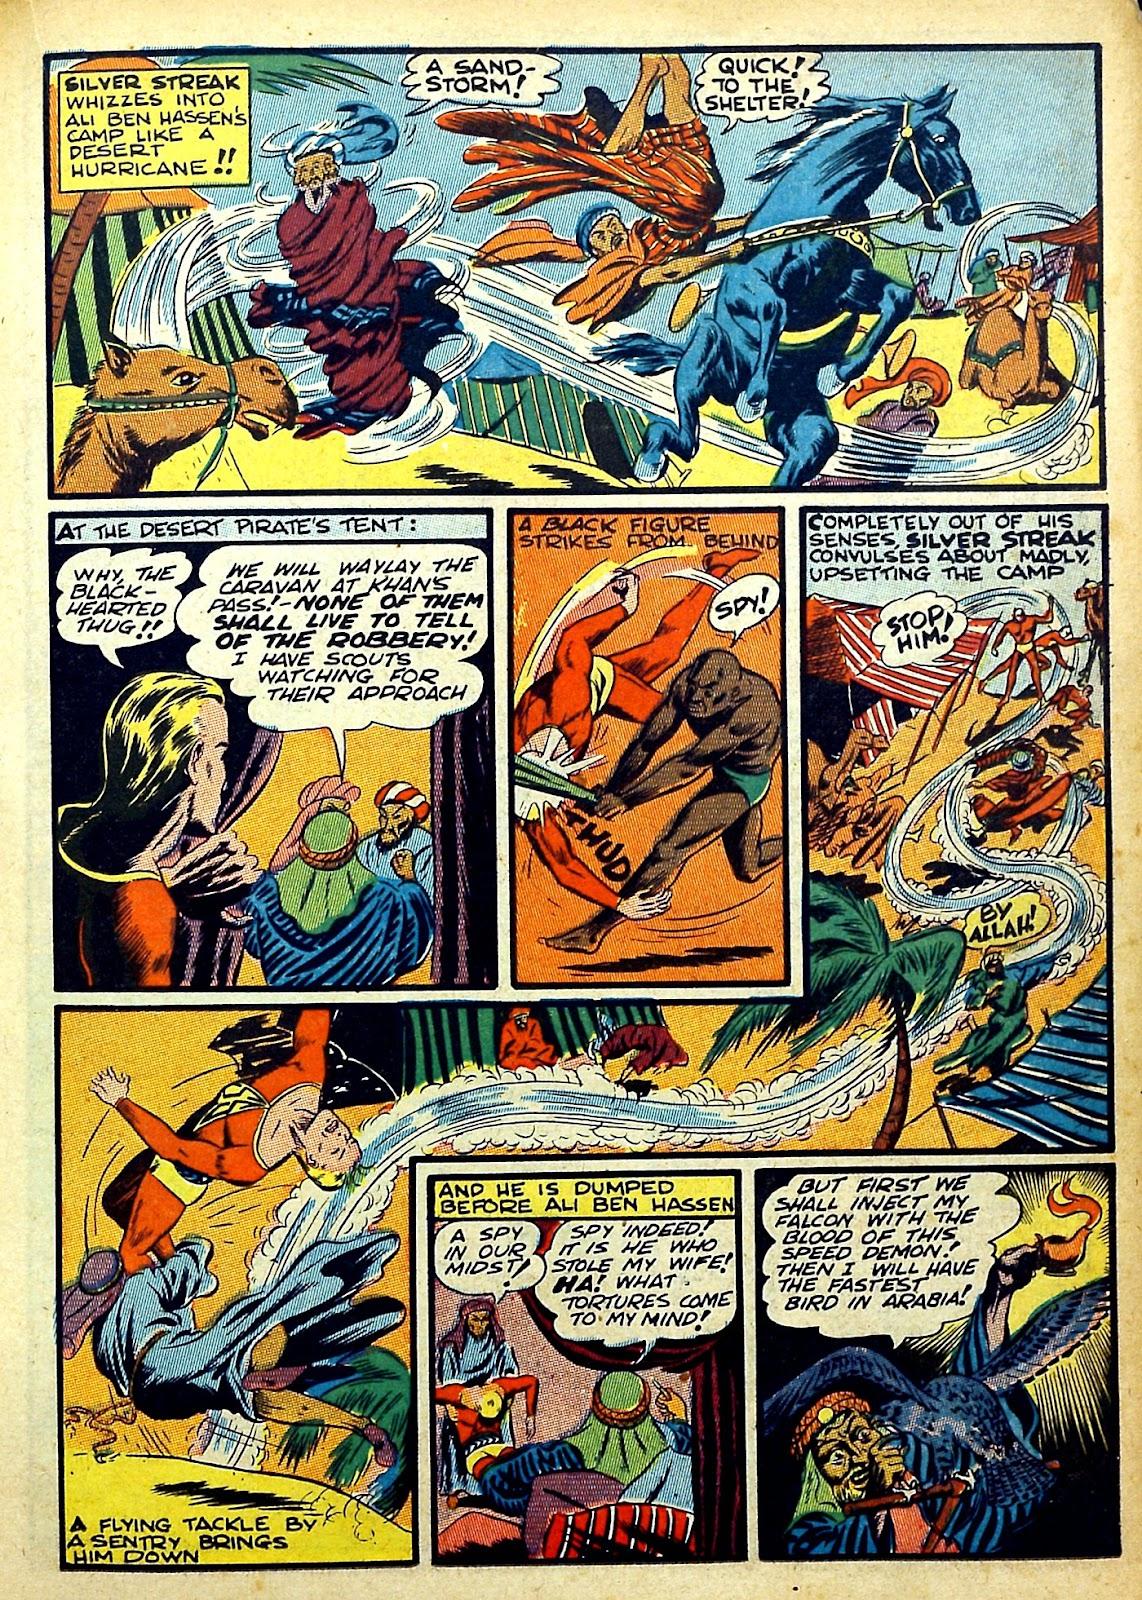 Read online Silver Streak Comics comic -  Issue #22 - 29